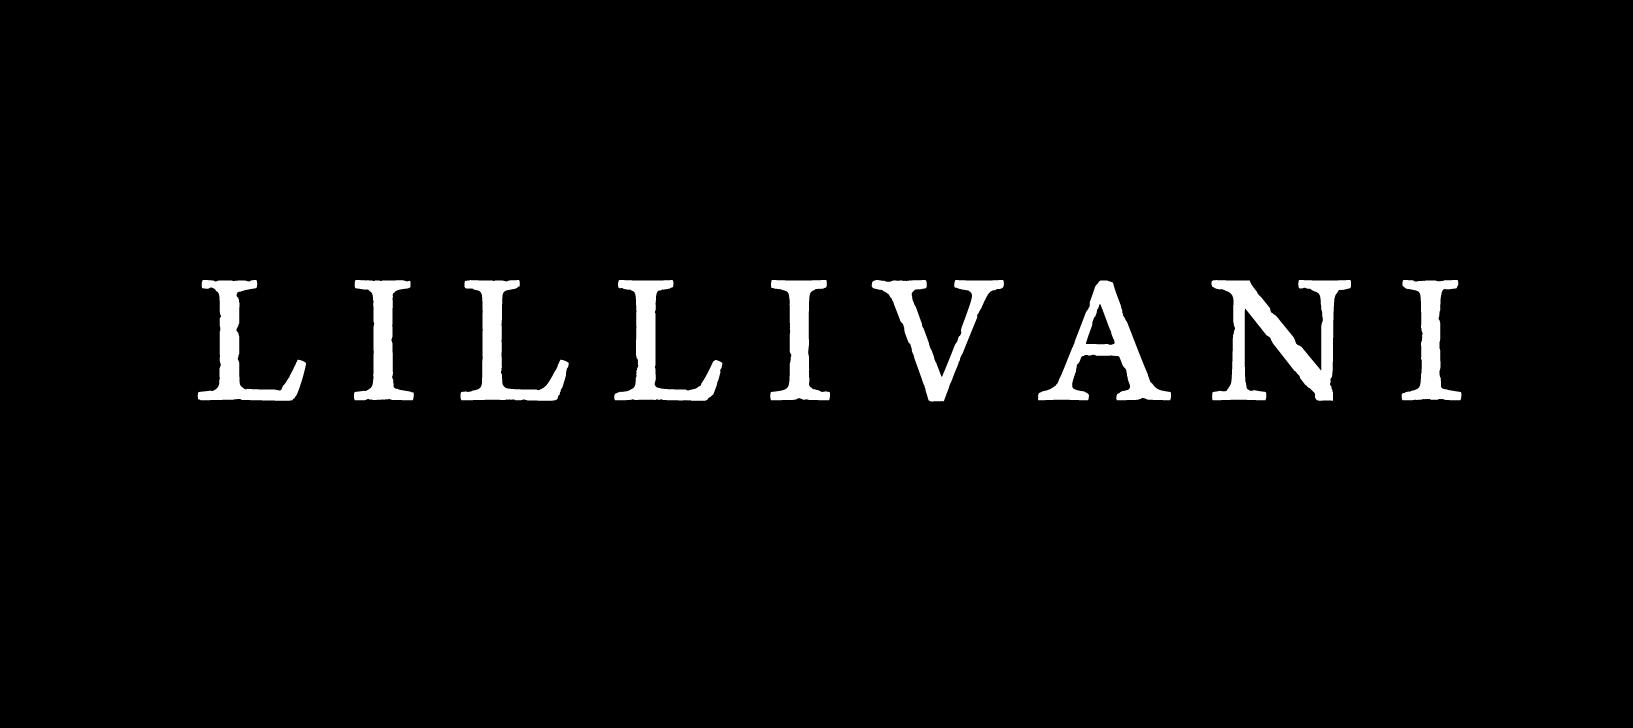 LILLIVANI online shop